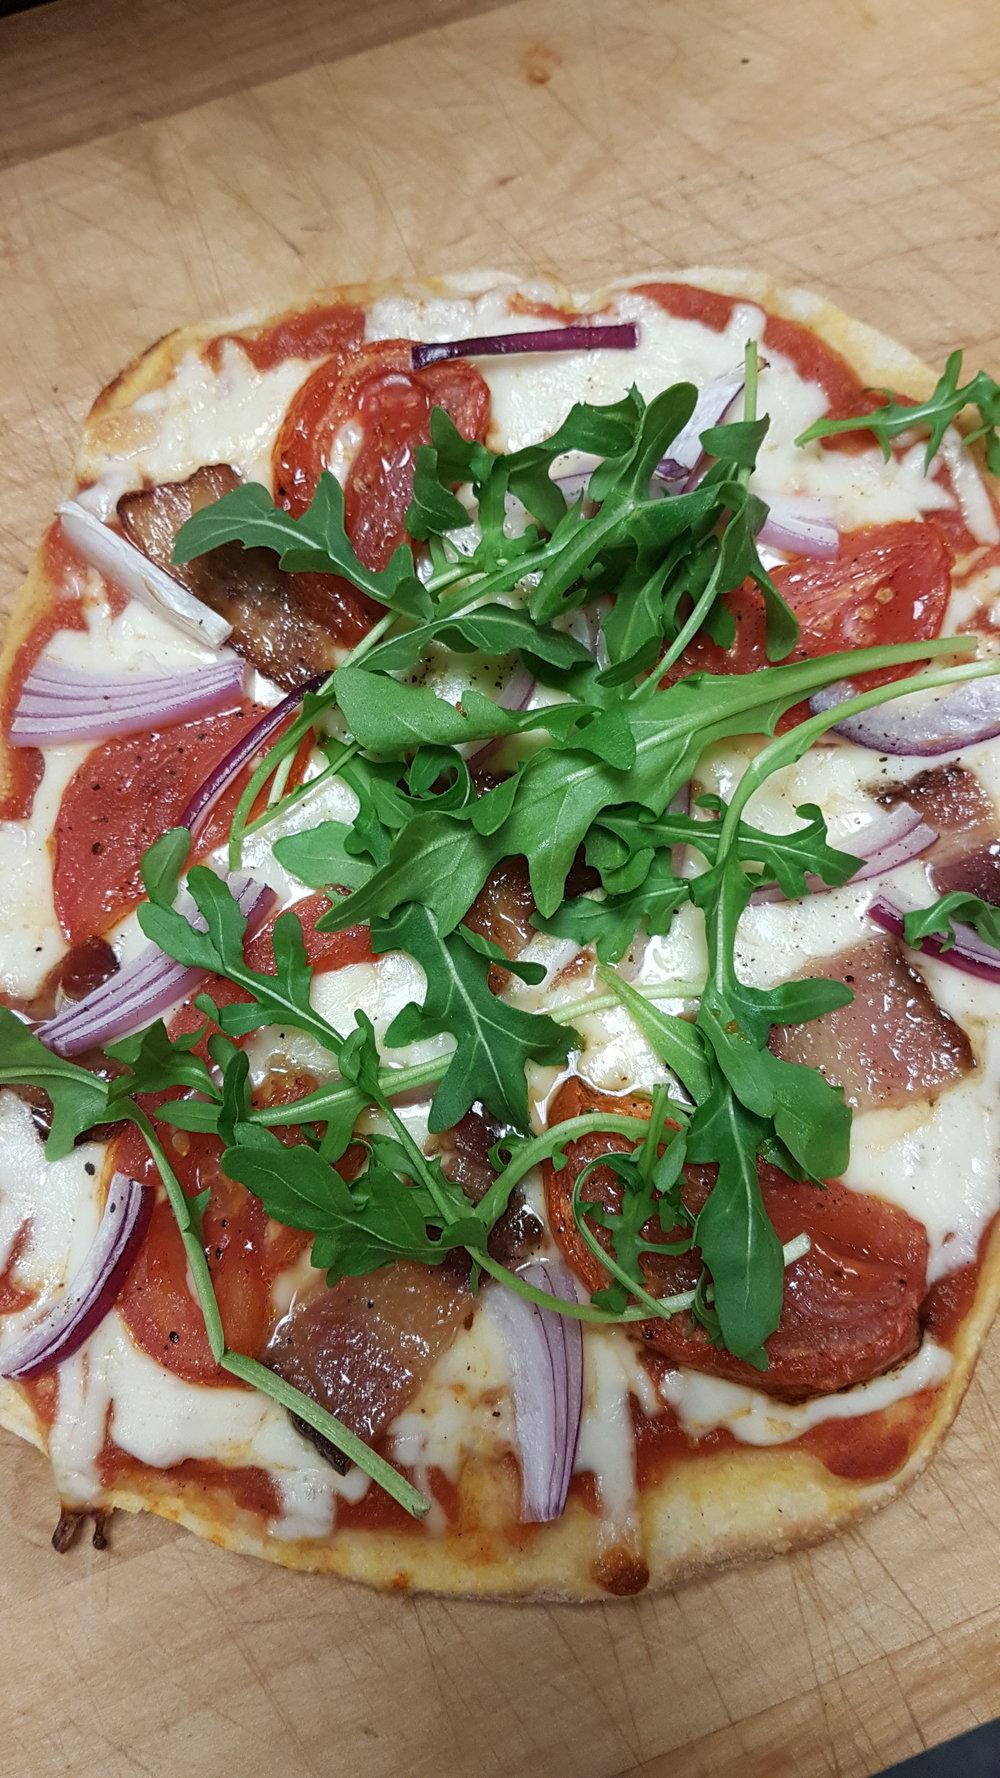 Pizza bacon roast tom arugula.jpg